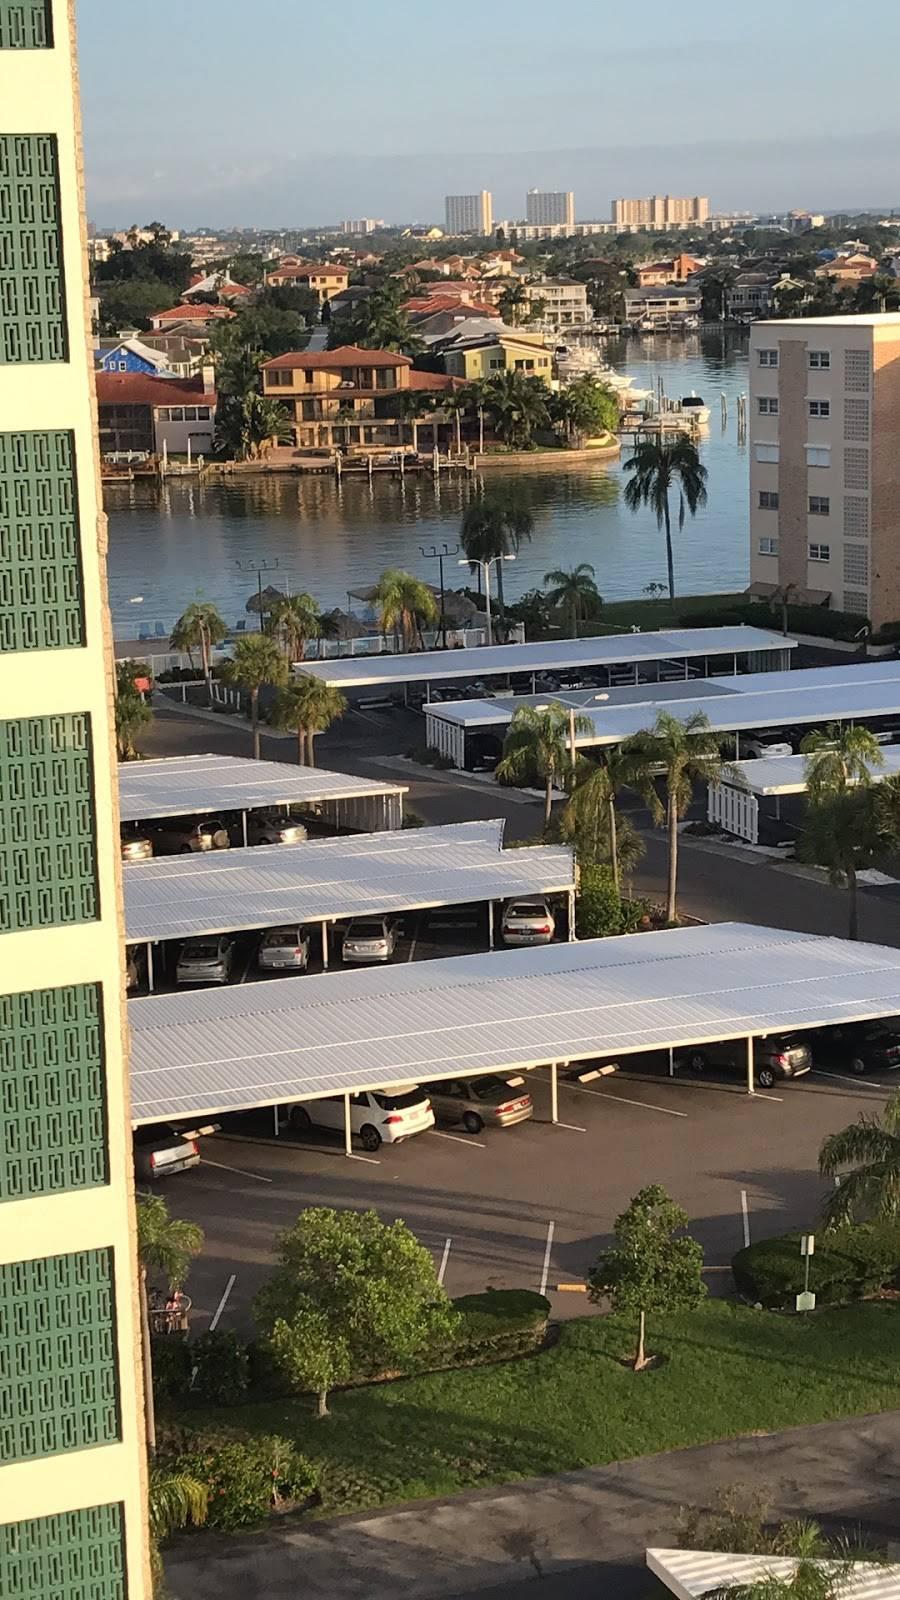 Townshores of Gulfport Inc   restaurant   6025 Shore Blvd S, Gulfport, FL 33707, USA   7273431094 OR +1 727-343-1094